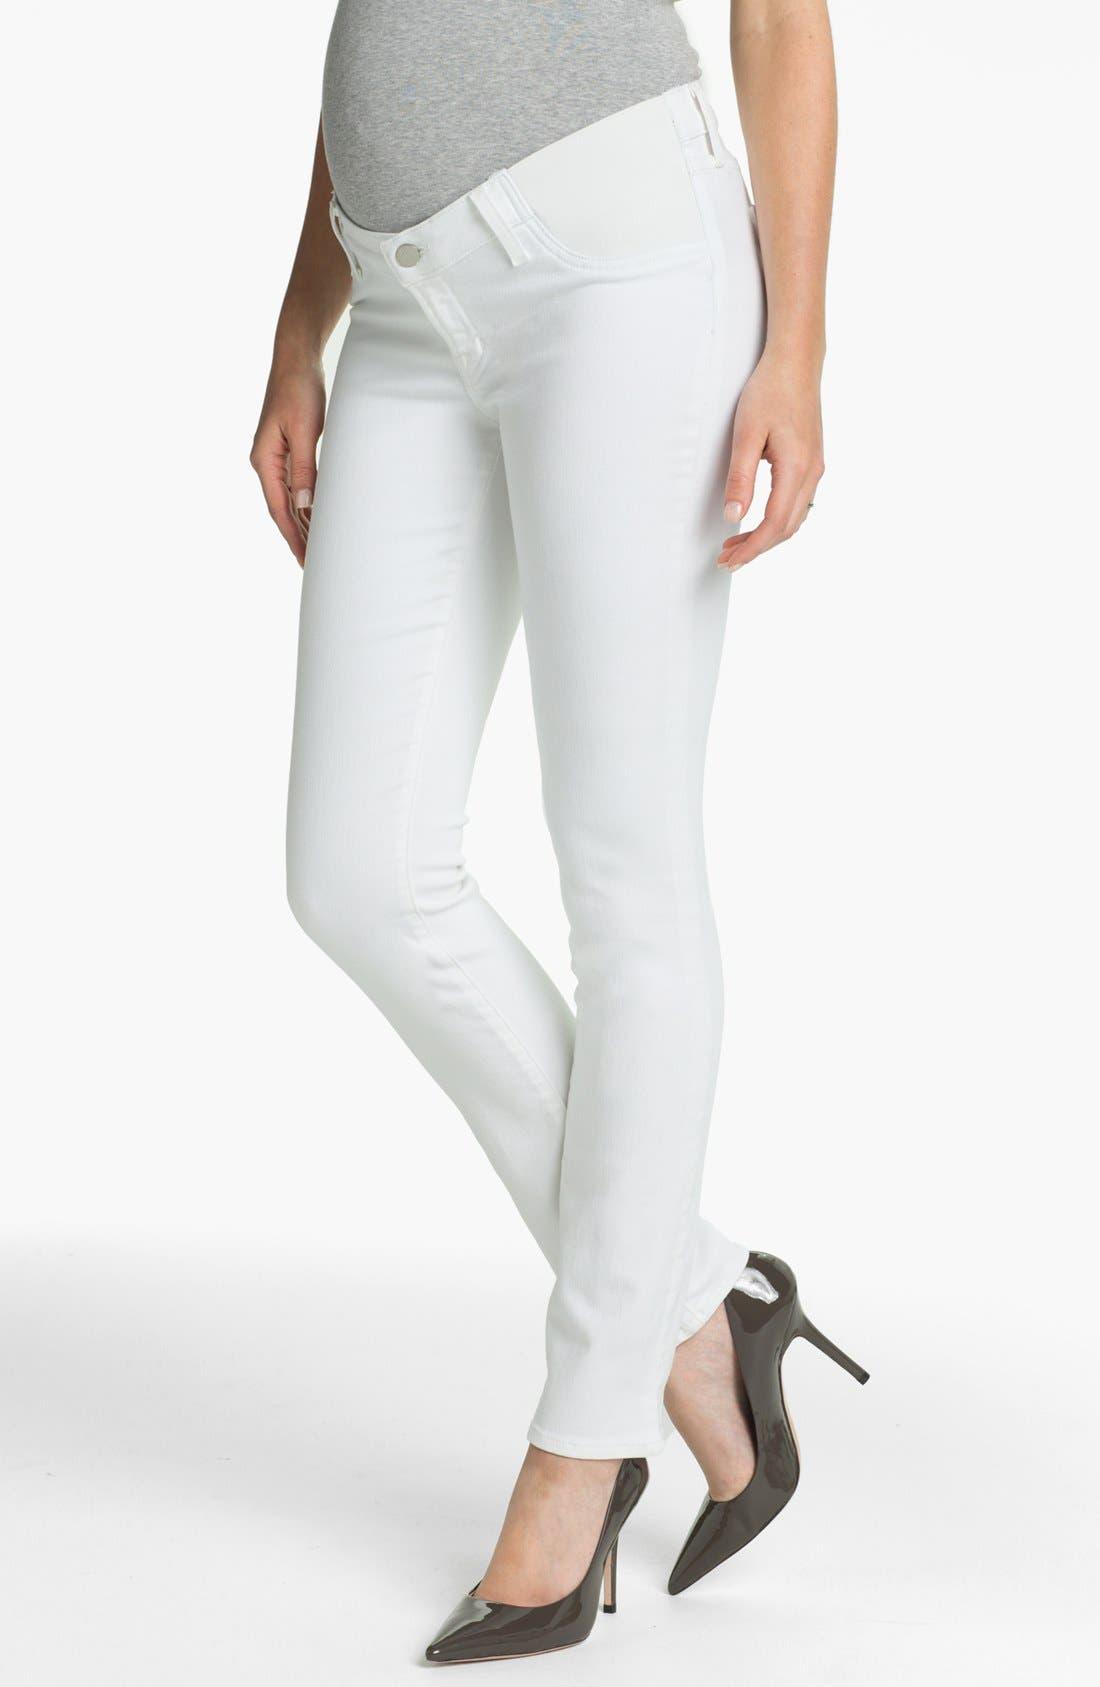 Alternate Image 1 Selected - J Brand Straight Leg Stretch Maternity Jeans (Blanc)